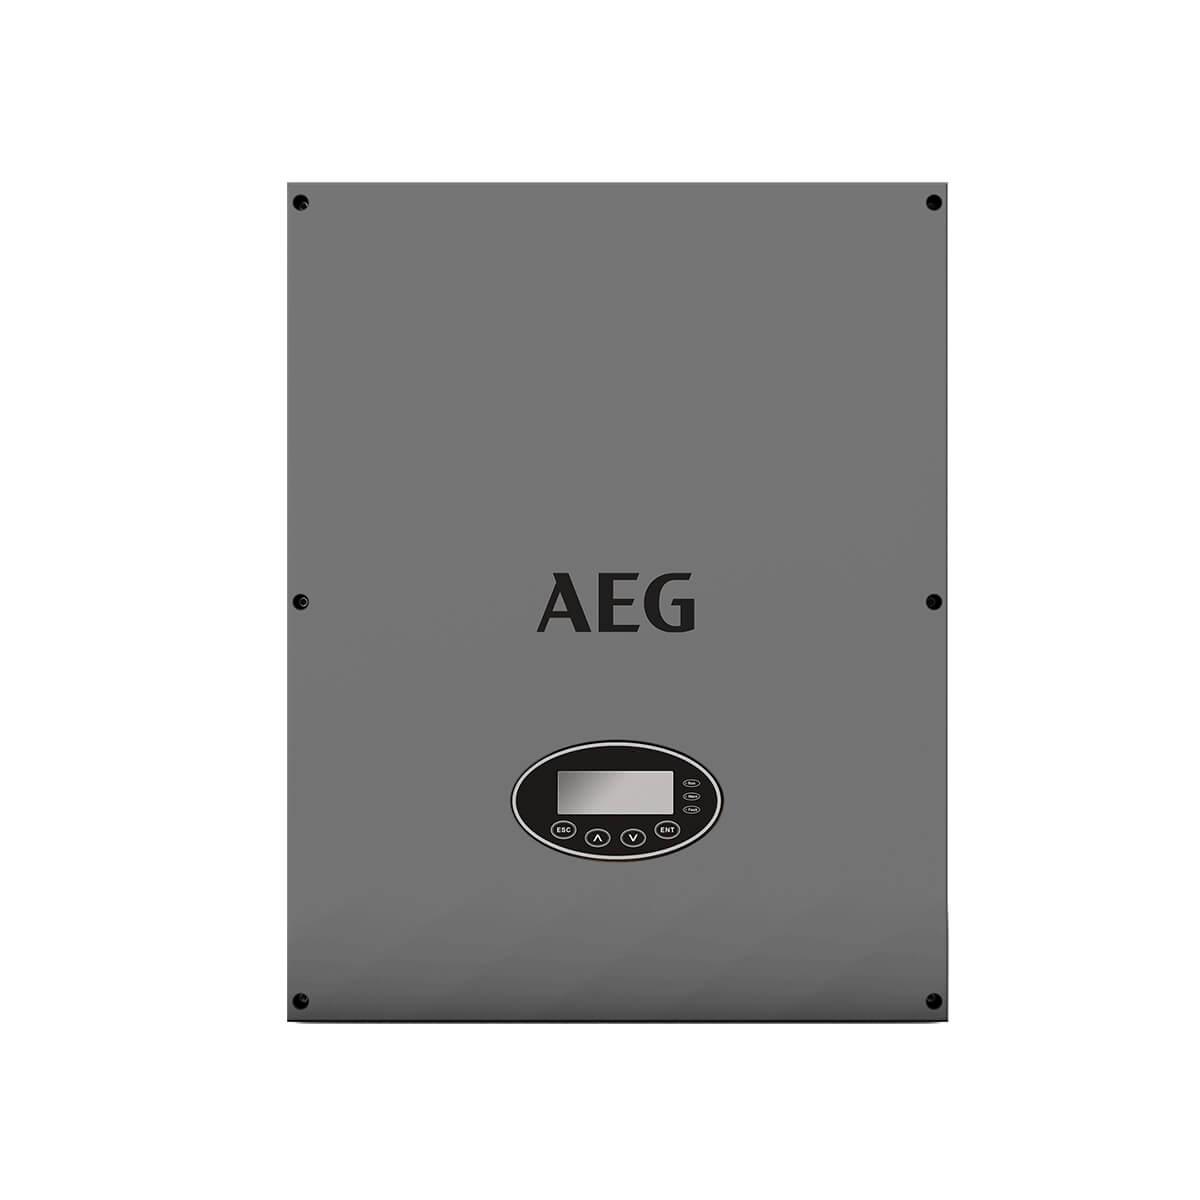 aeg 17kW inverter, aeg as-ic01 17kW inverter, aeg as-ic01-17000-2 inverter, aeg as-ic01-17000-2, aeg as-ic01 17kW